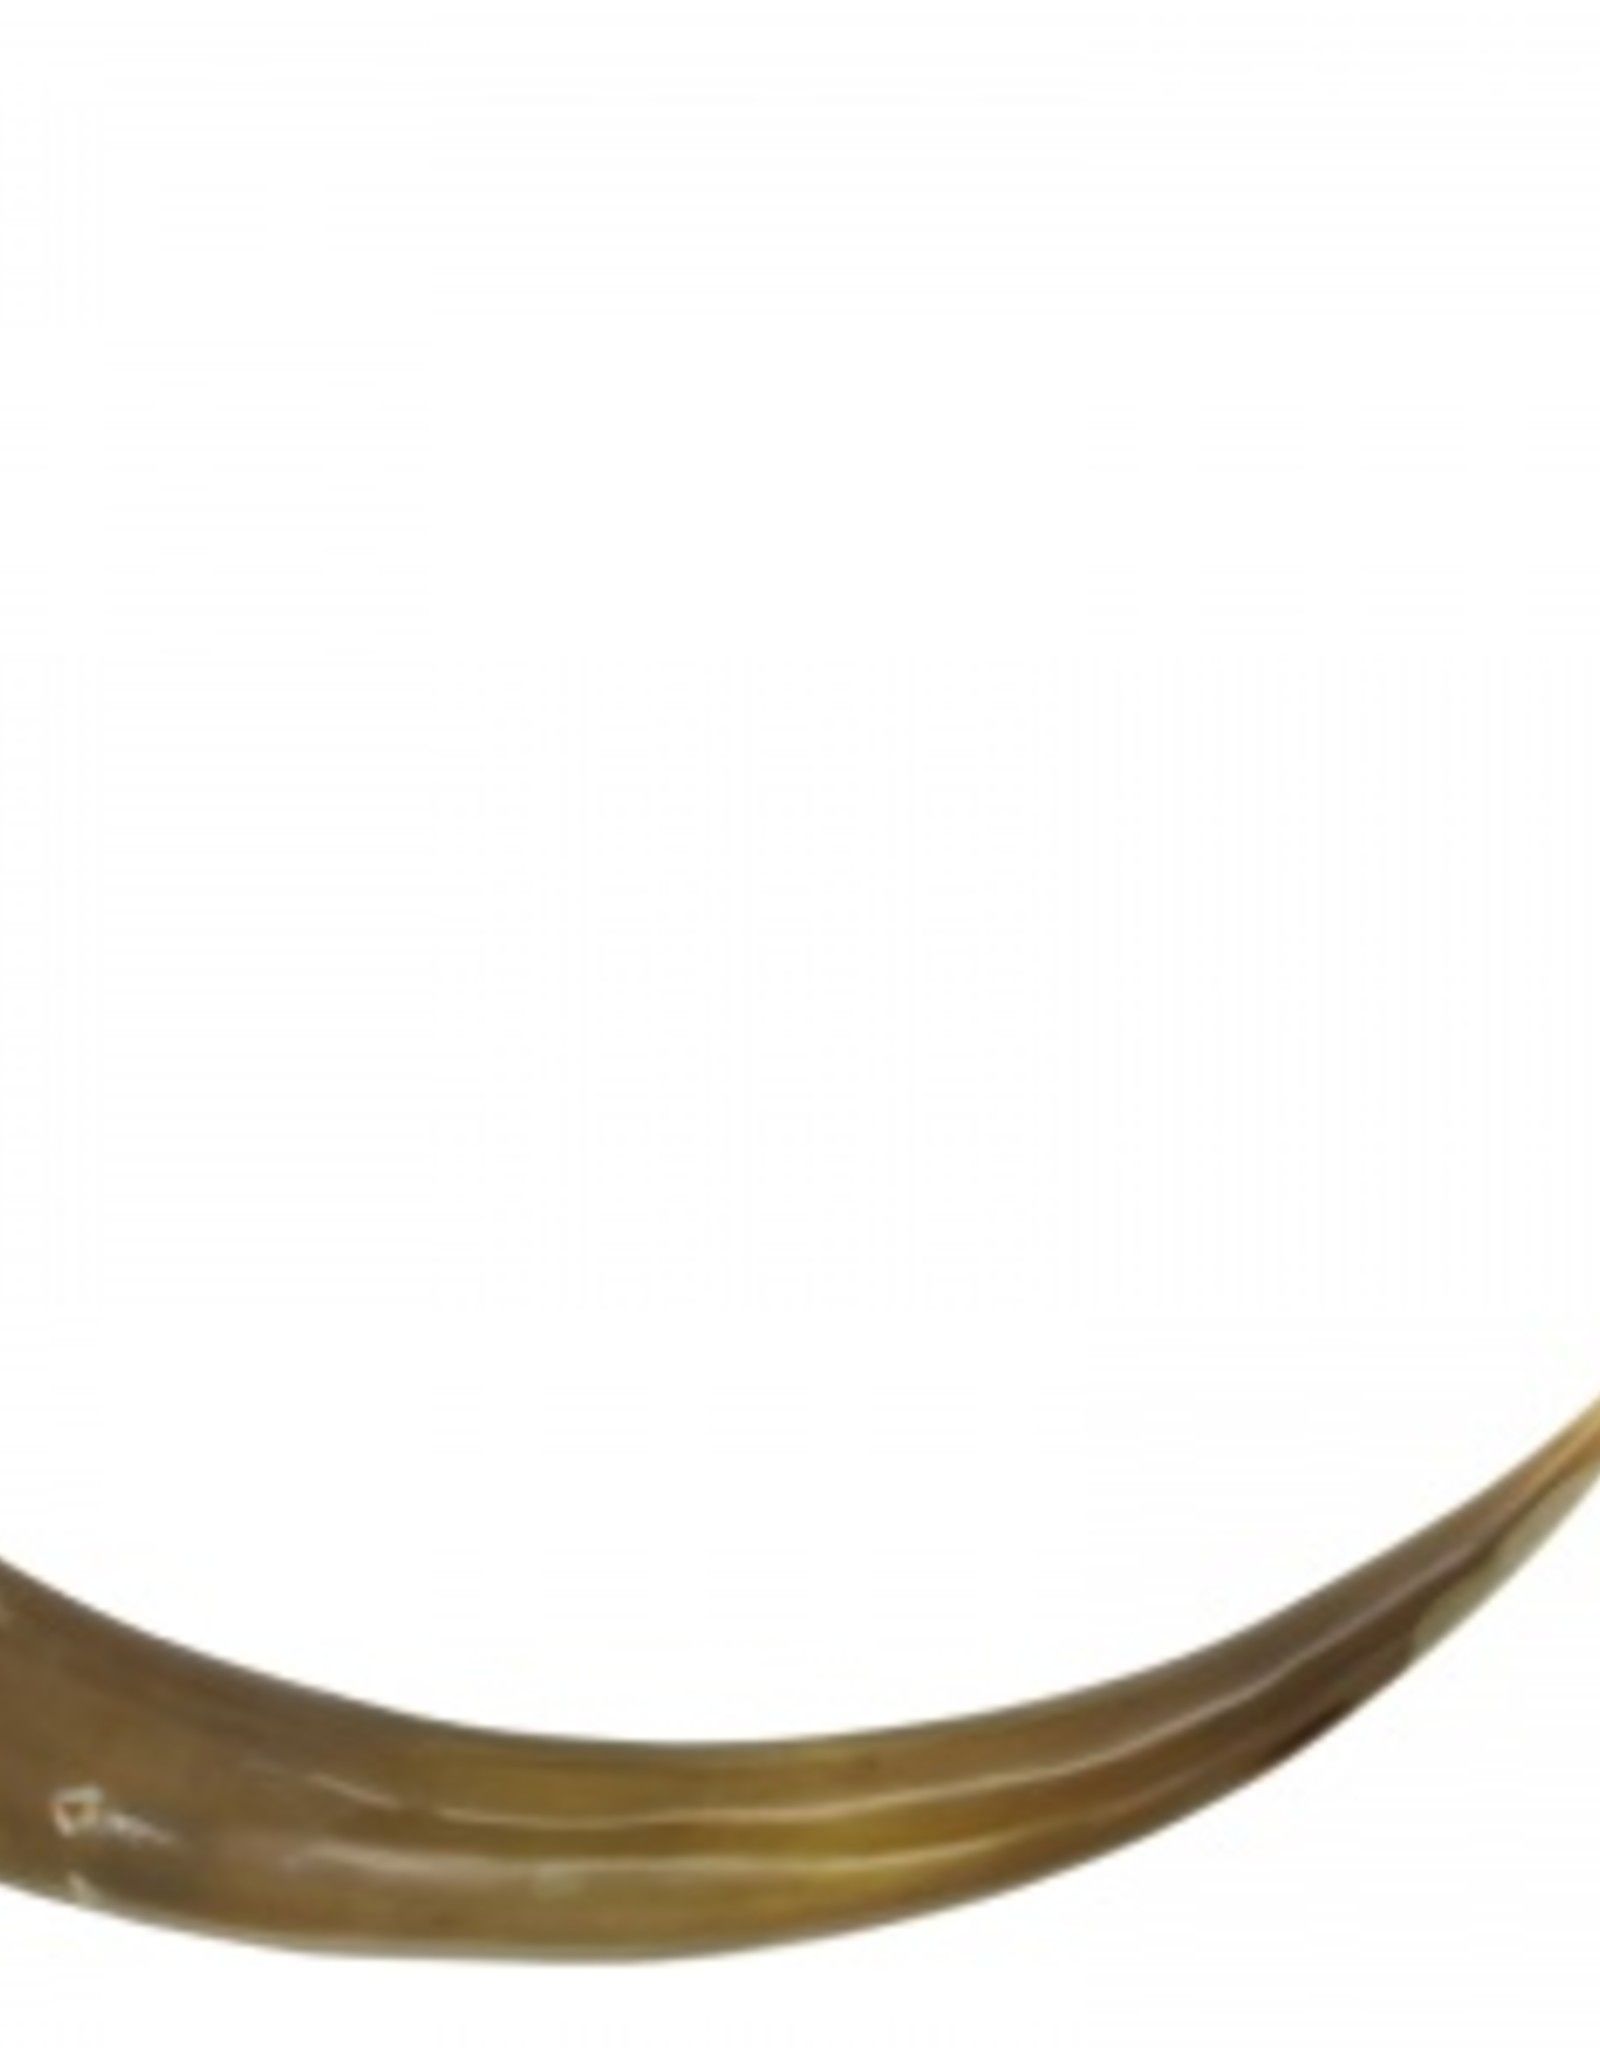 Lifestyle buffalo horn L